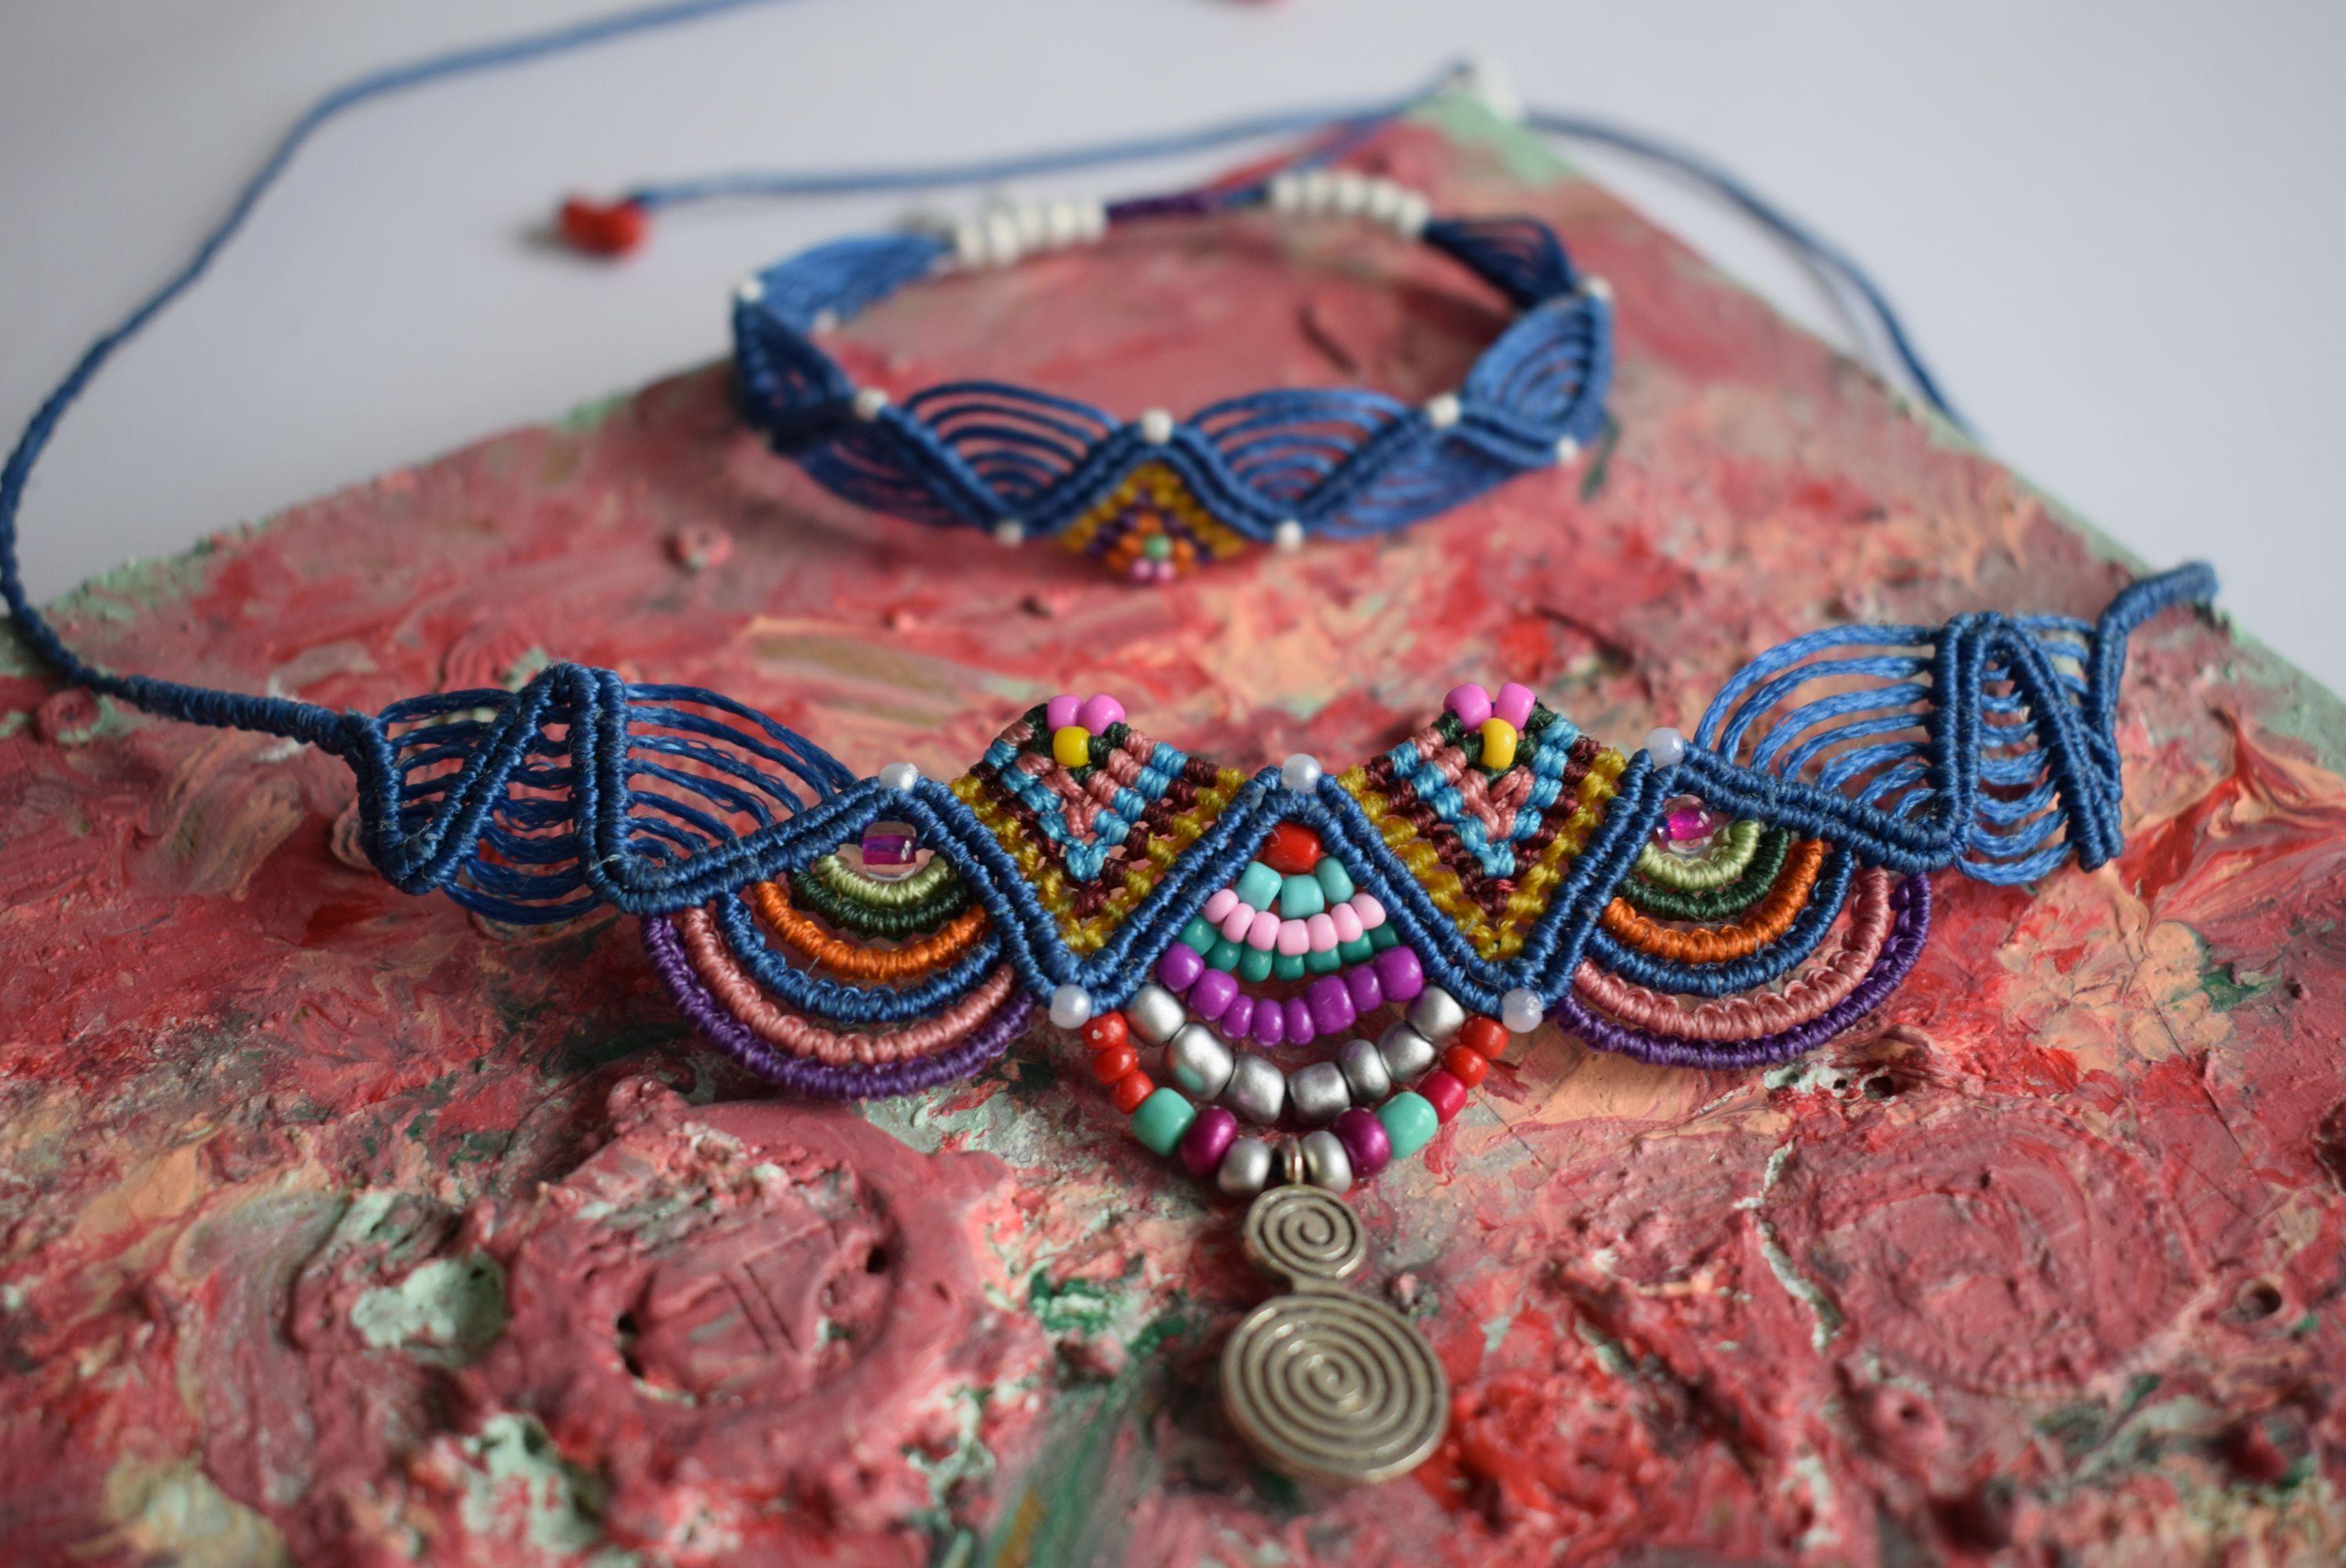 sets hippie unique hand gift set macrame friendship blue jewelry handmade necklace bracelet woven work braided bracelets anklet bohochic